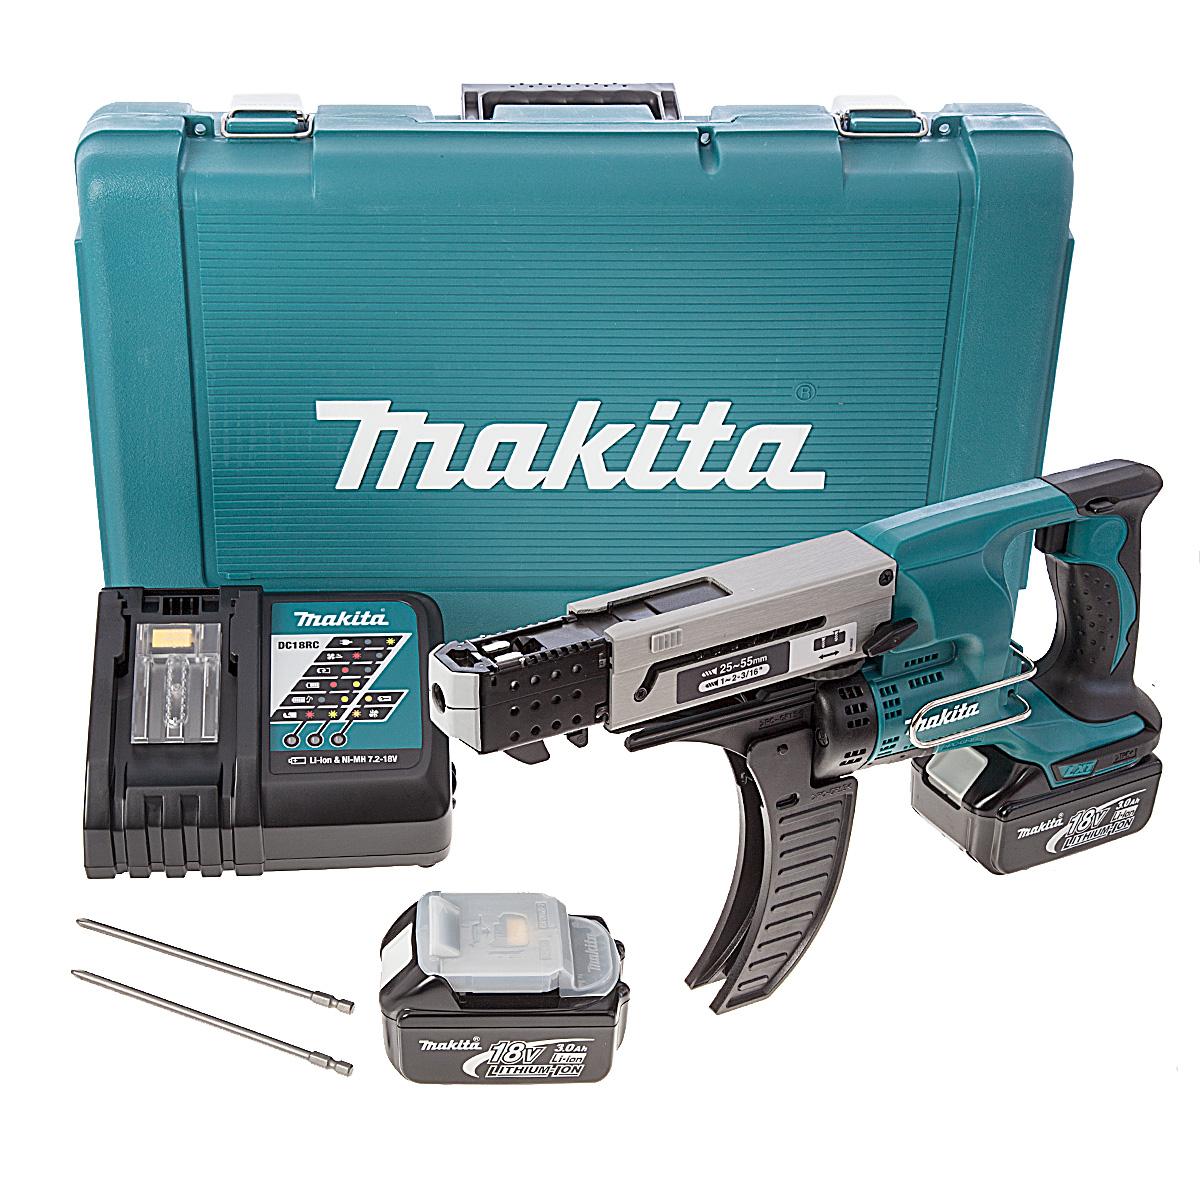 Skrutrekker Makita DFR550RFE 18 V 2x3,0 Ah batt.